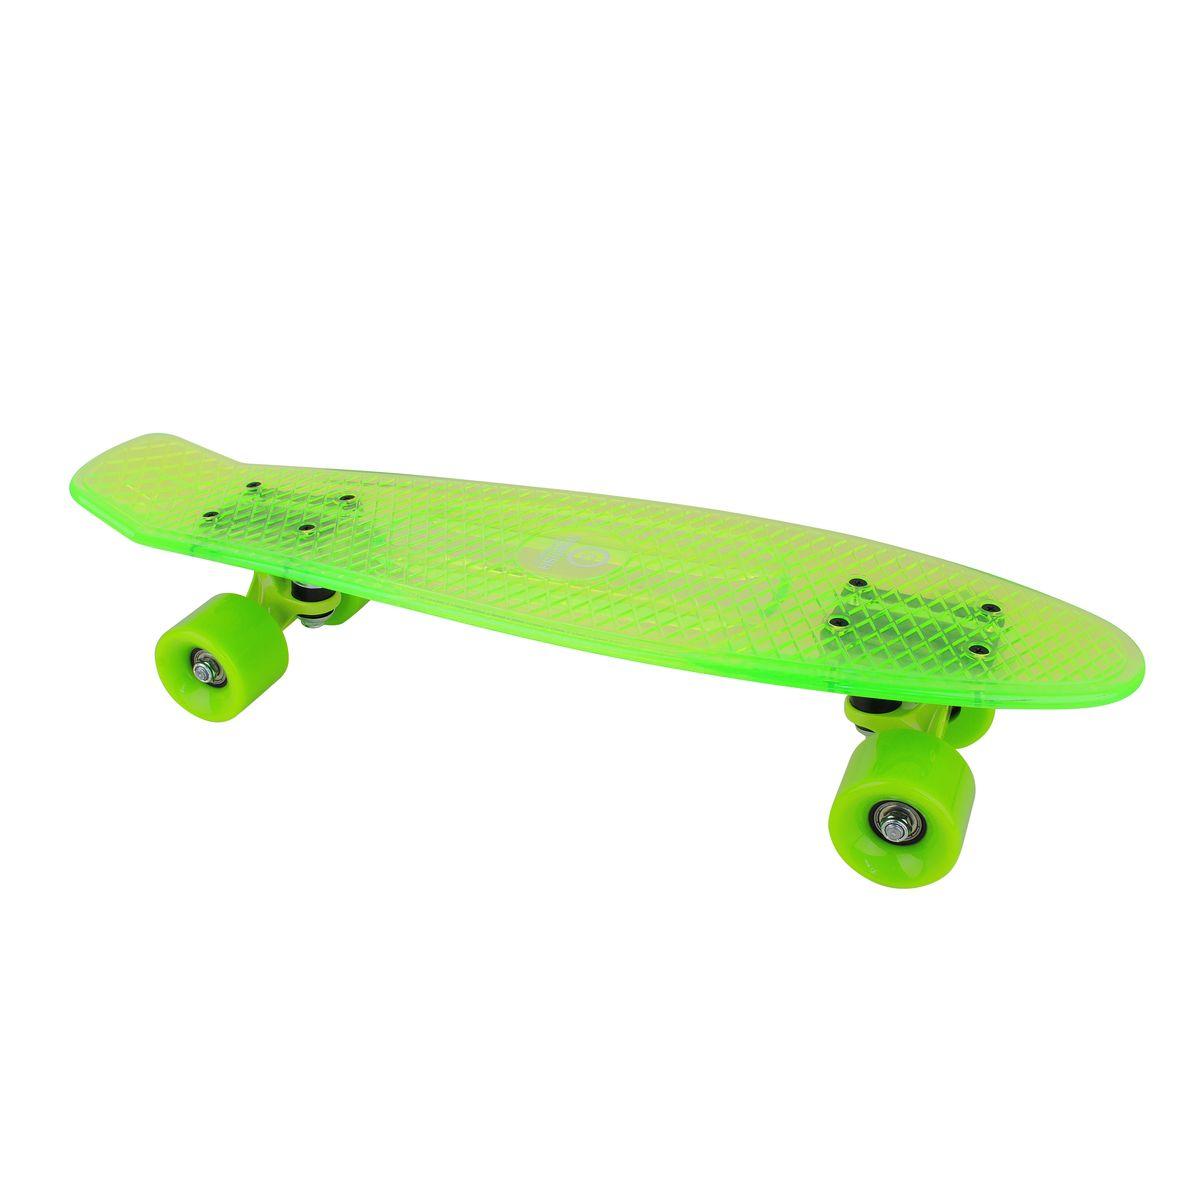 Скейтборд пластиковый Tempish Buffy Star, цвет: зеленыйУТ-00008230Пени борд Tempish Buffy нагрузка до 100 кг